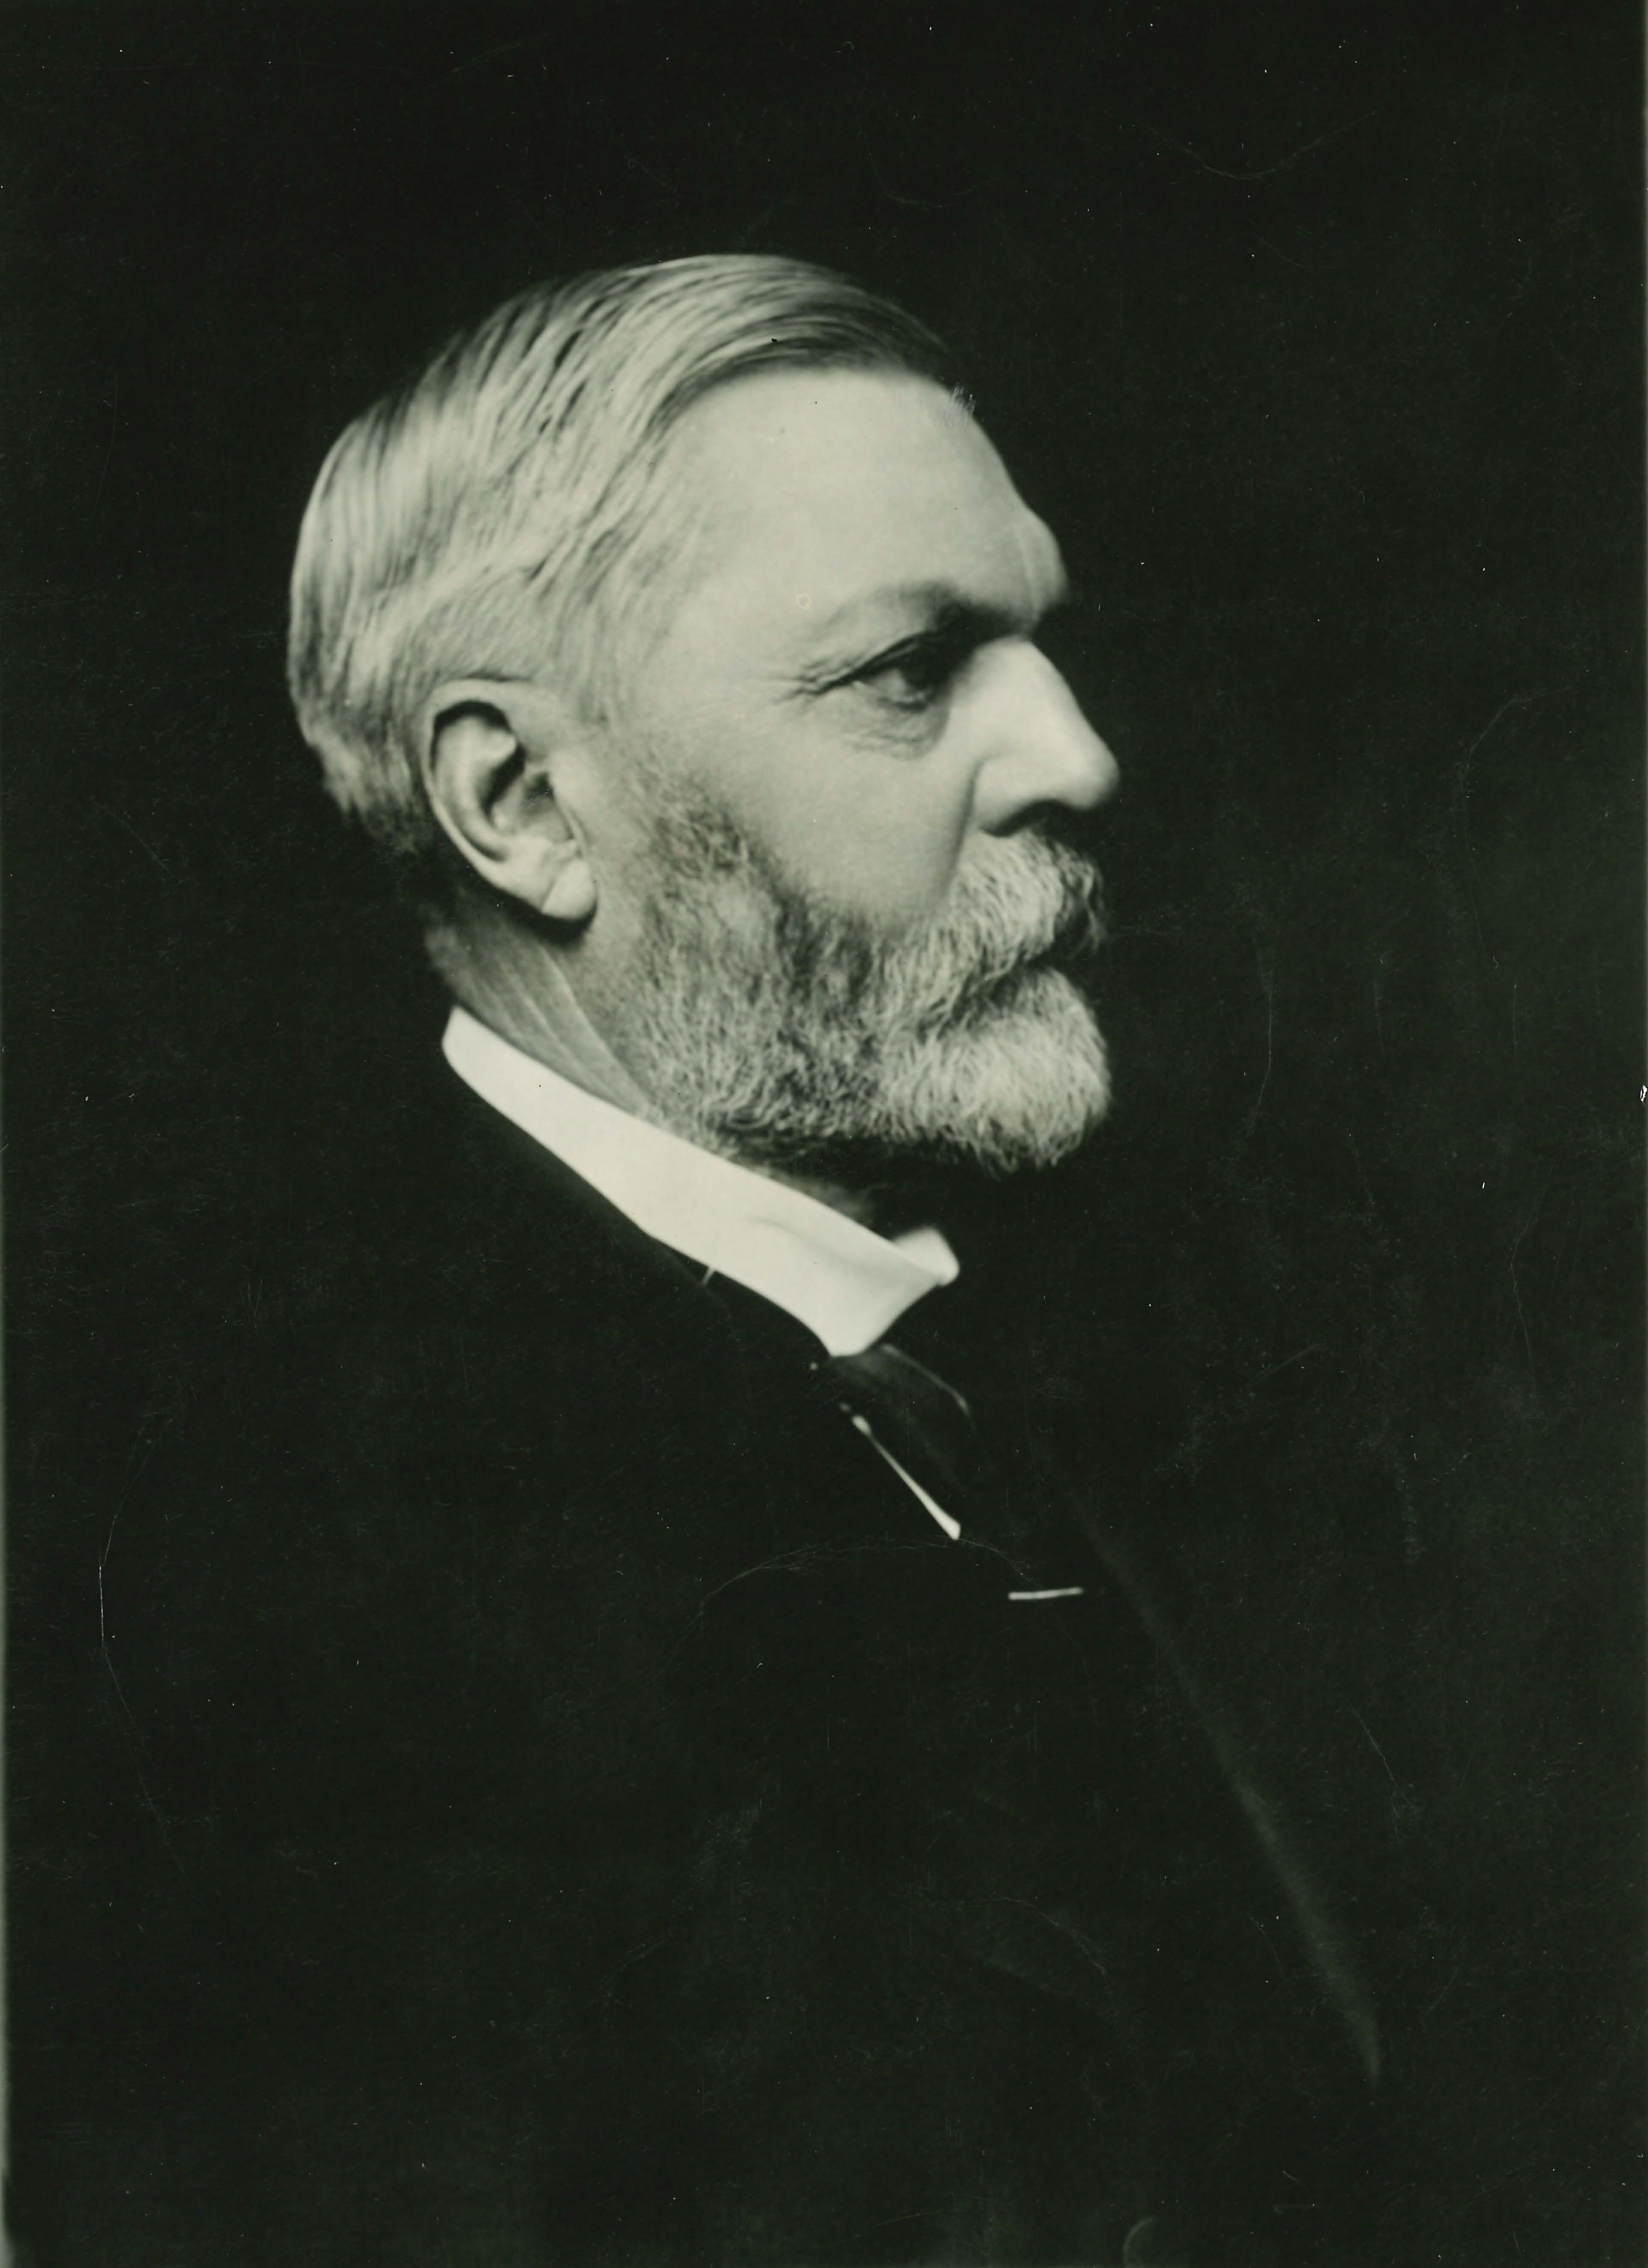 Roebling portrait